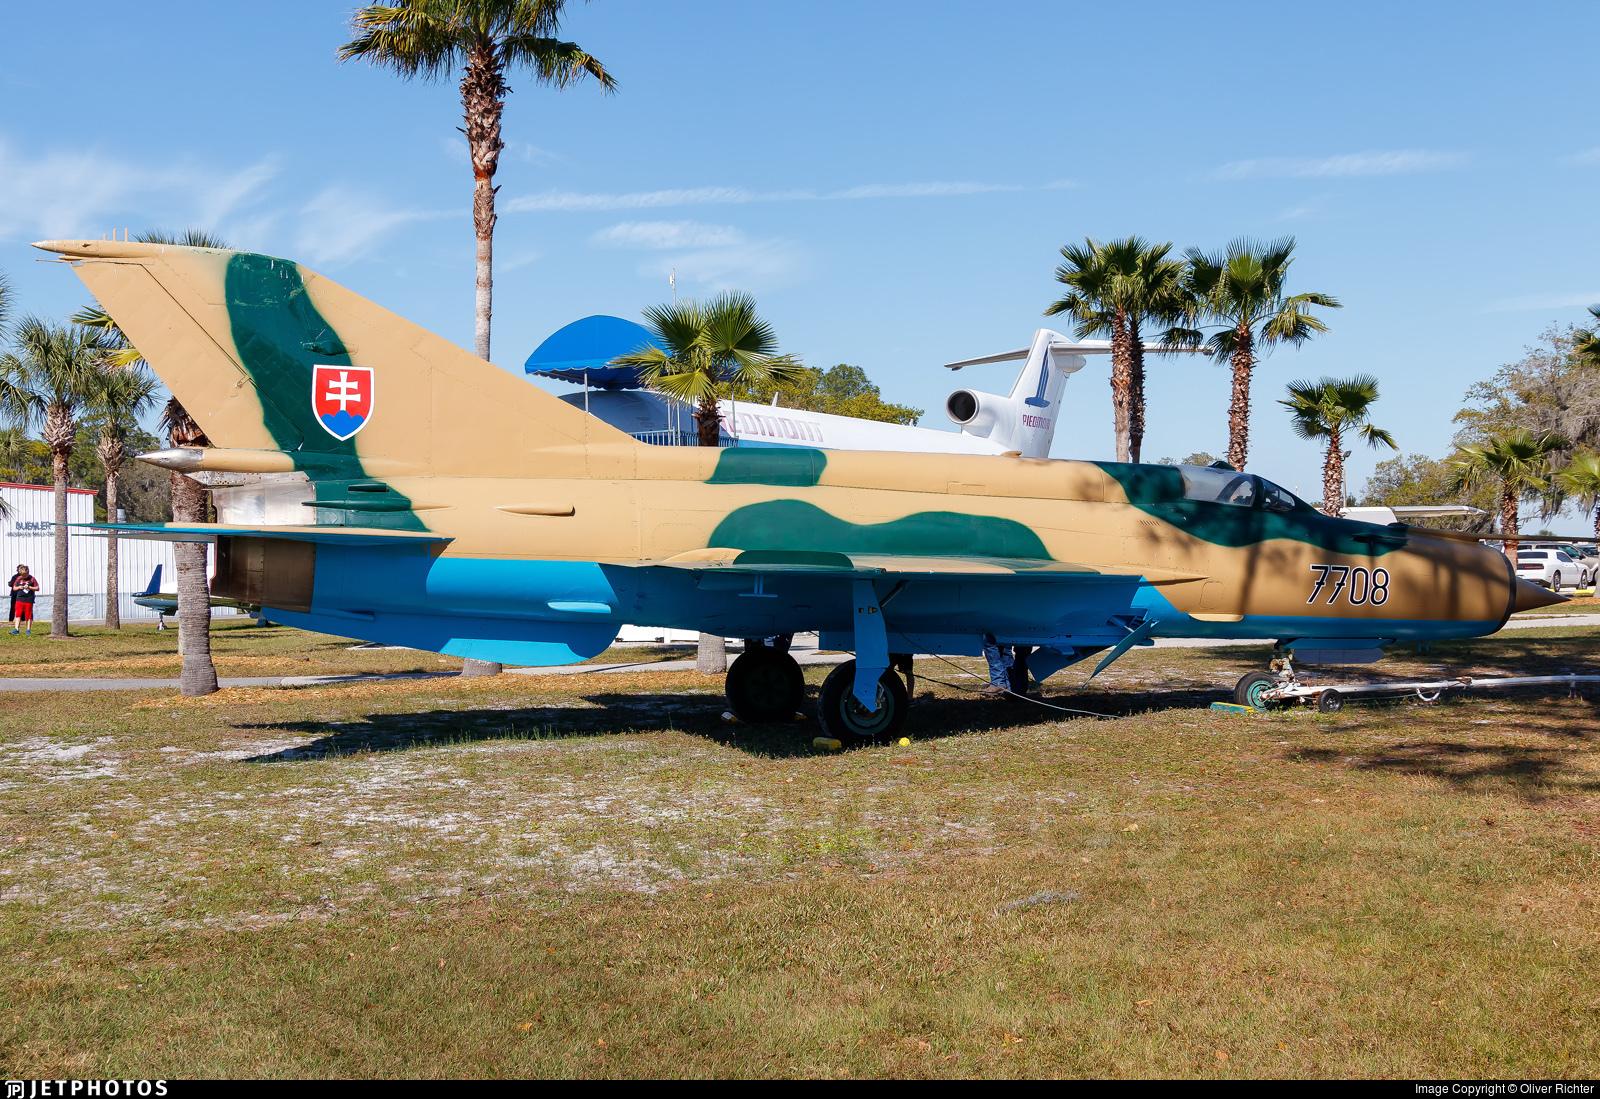 N7708 - Mikoyan-Gurevich MiG-21MF Lancer C - Private